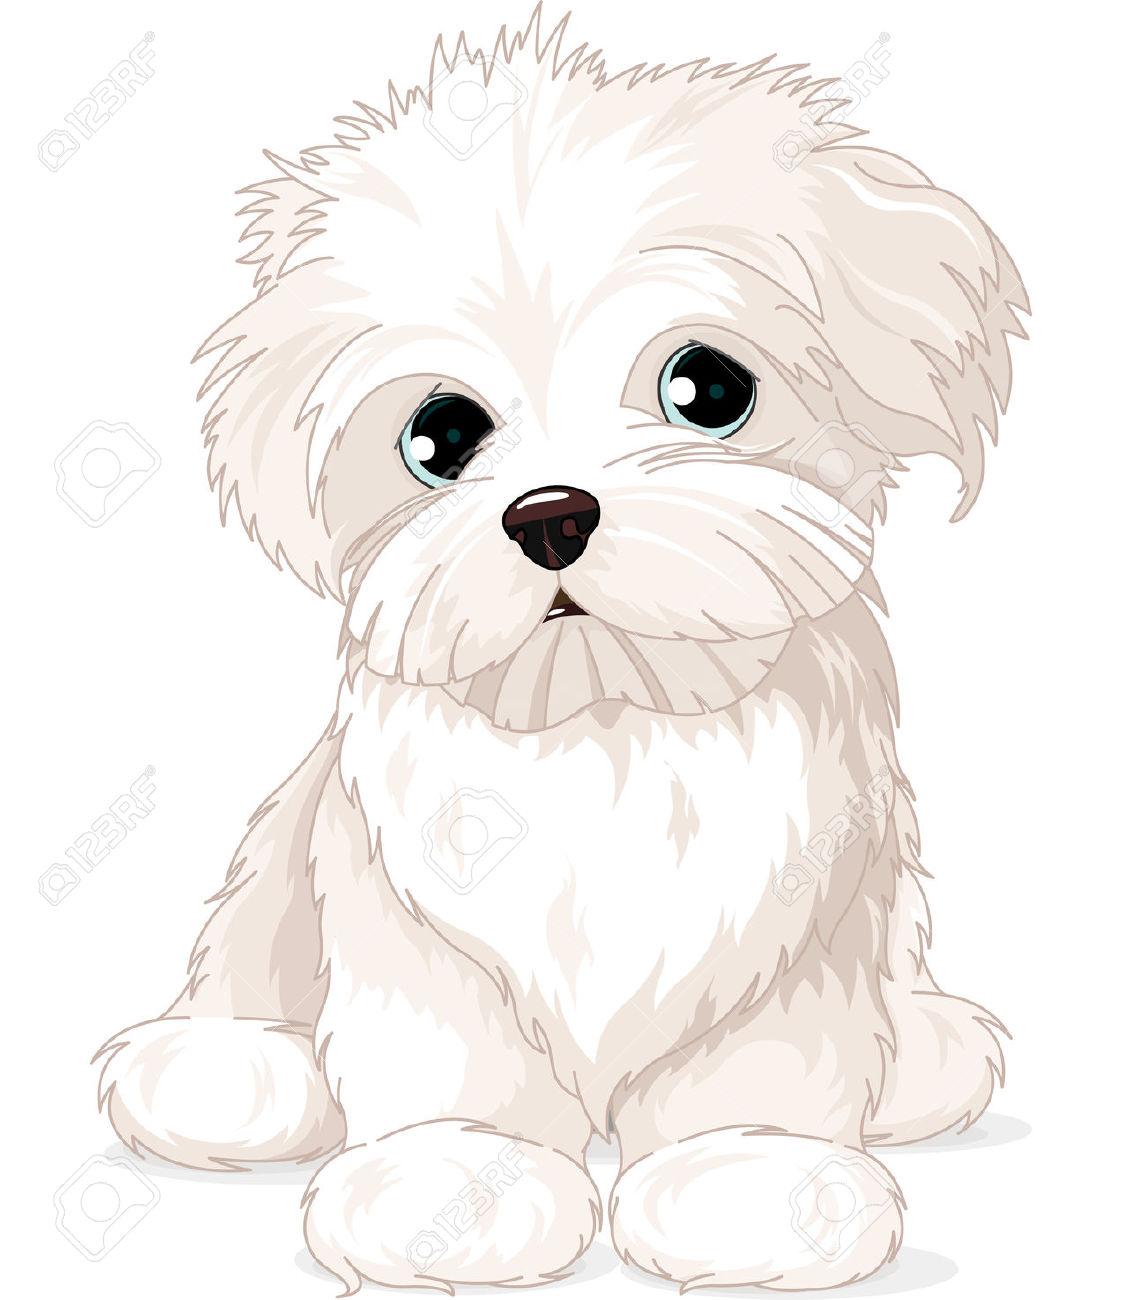 maltese clipart clipground maltese flag clipart maltese poodle clipart